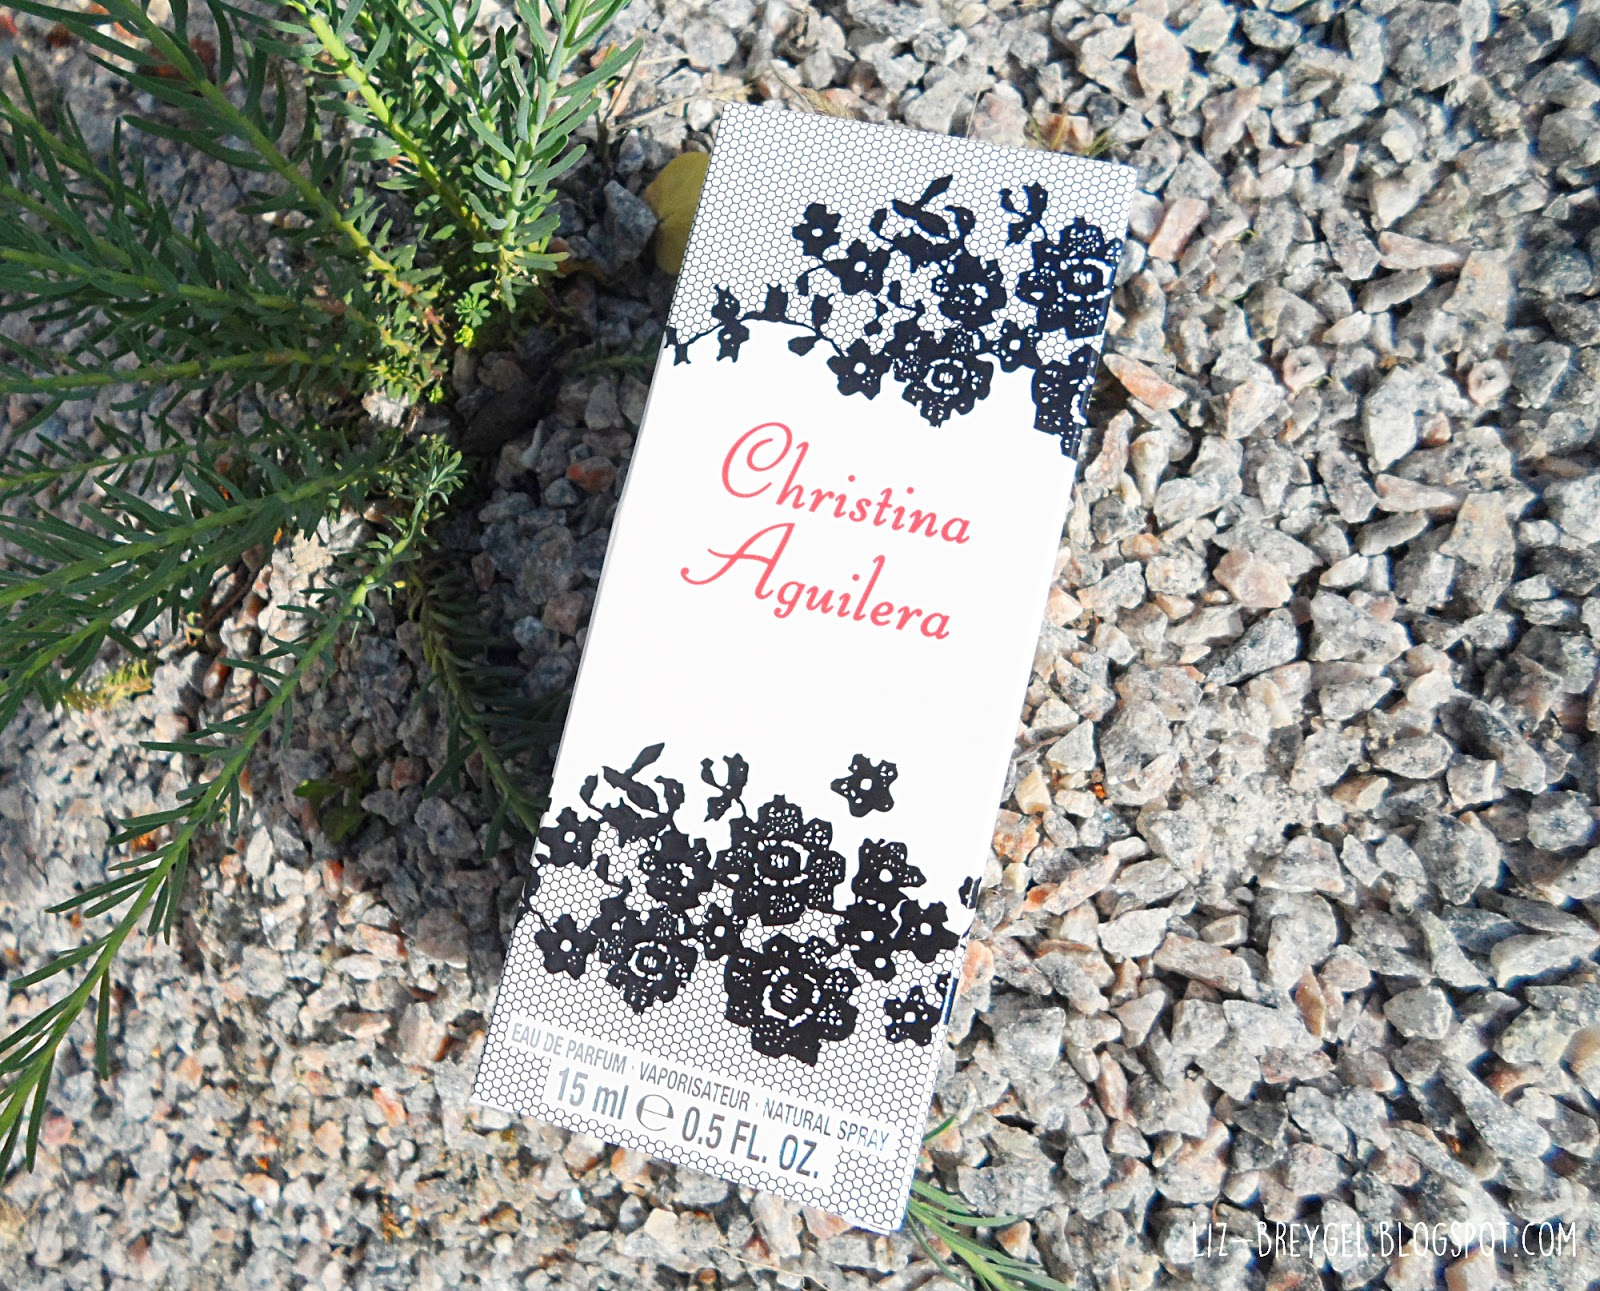 Christina Aguilera buy online liz breygel beauty blogger review Christina Aguilera Perfume fragrance aroma description